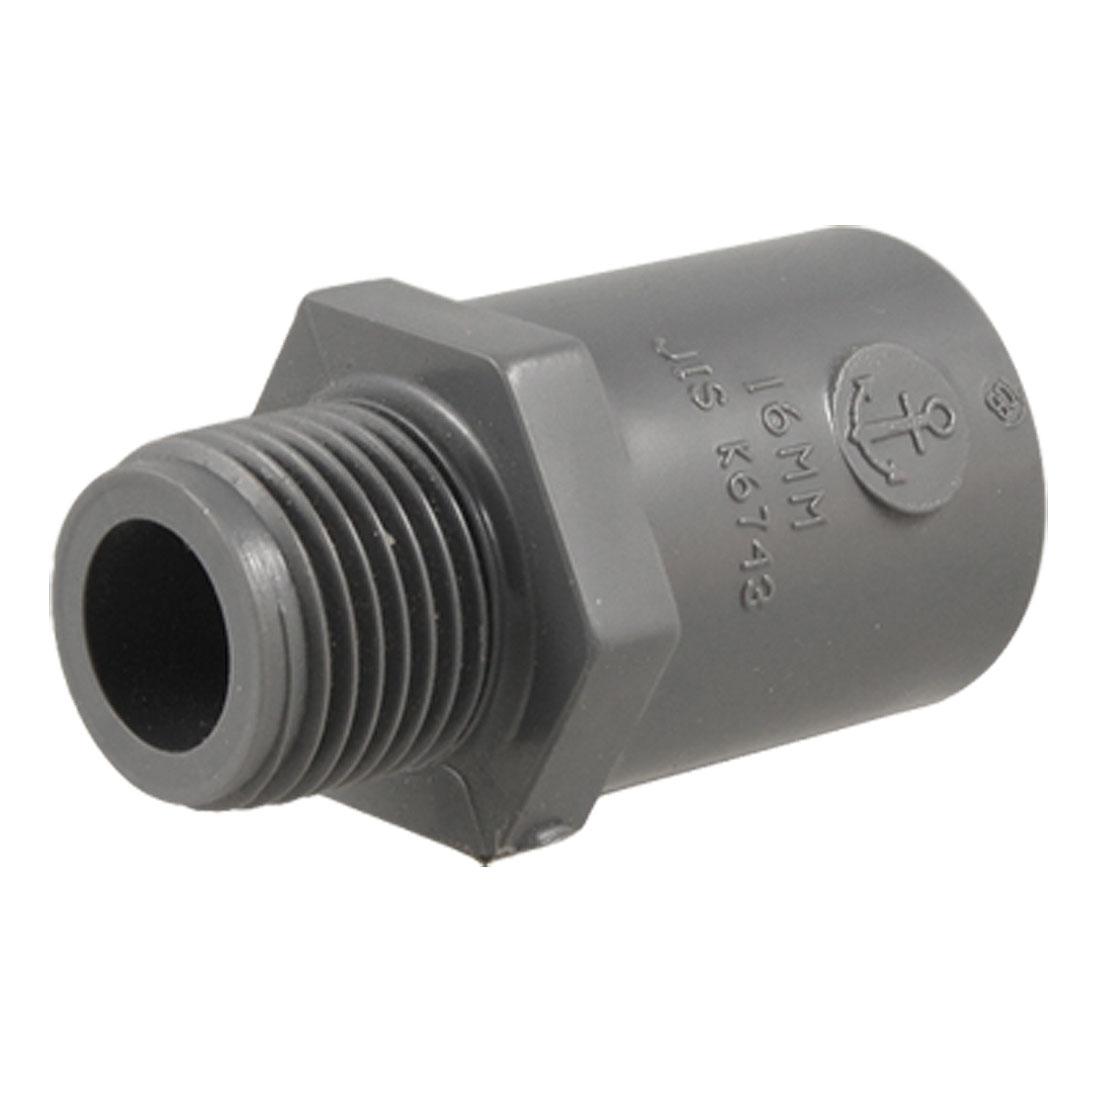 22mm Hole Inner Diameter Male Thread PVC Pipe Adapter